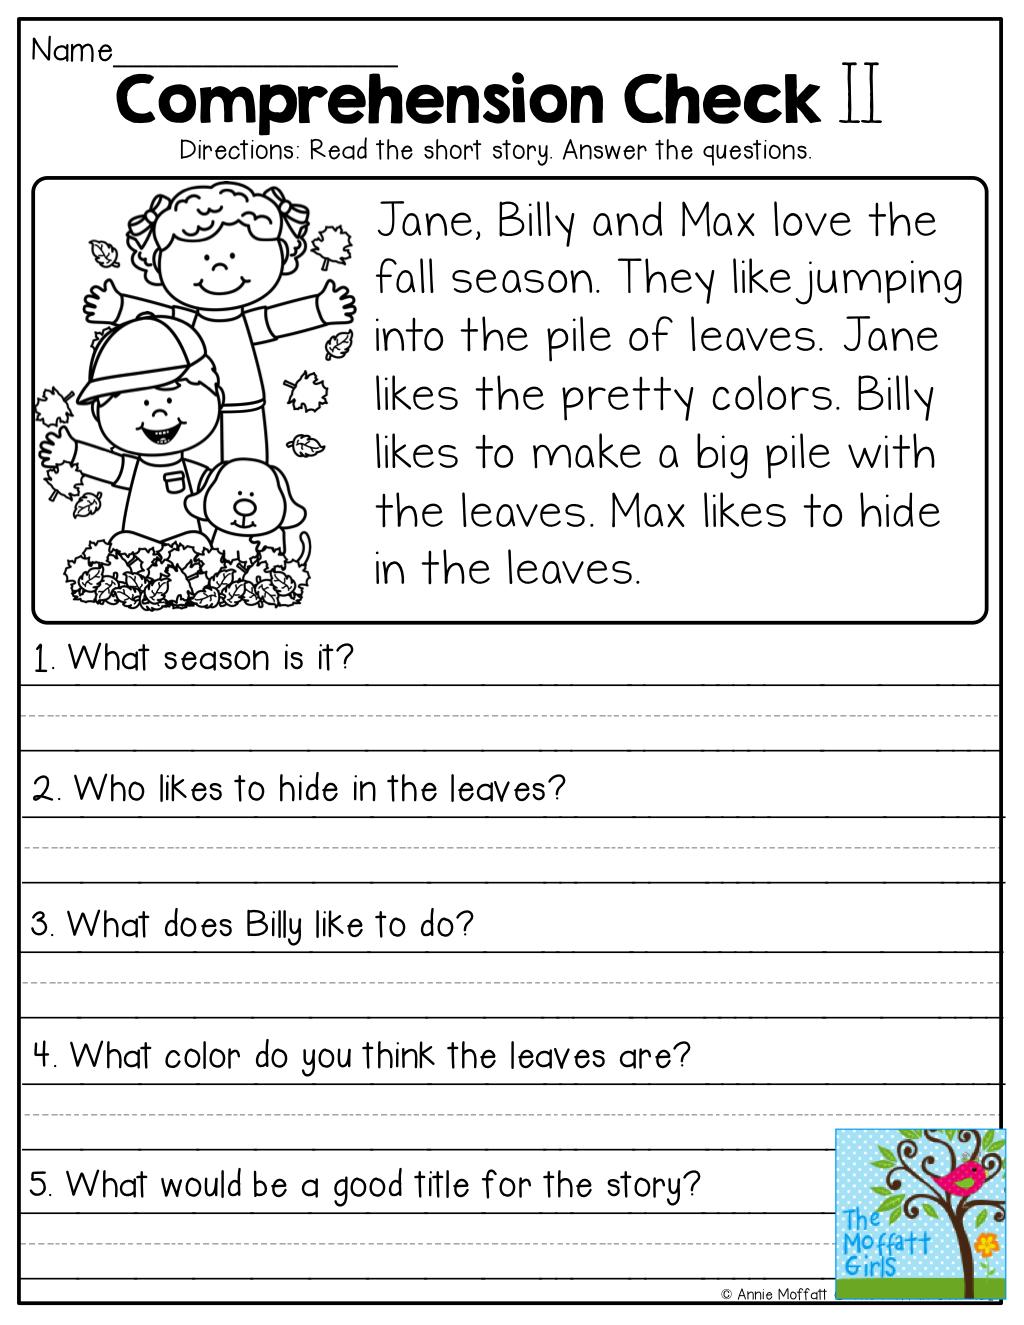 Worksheet  Free Printable 7th Grade Reading Comprehension